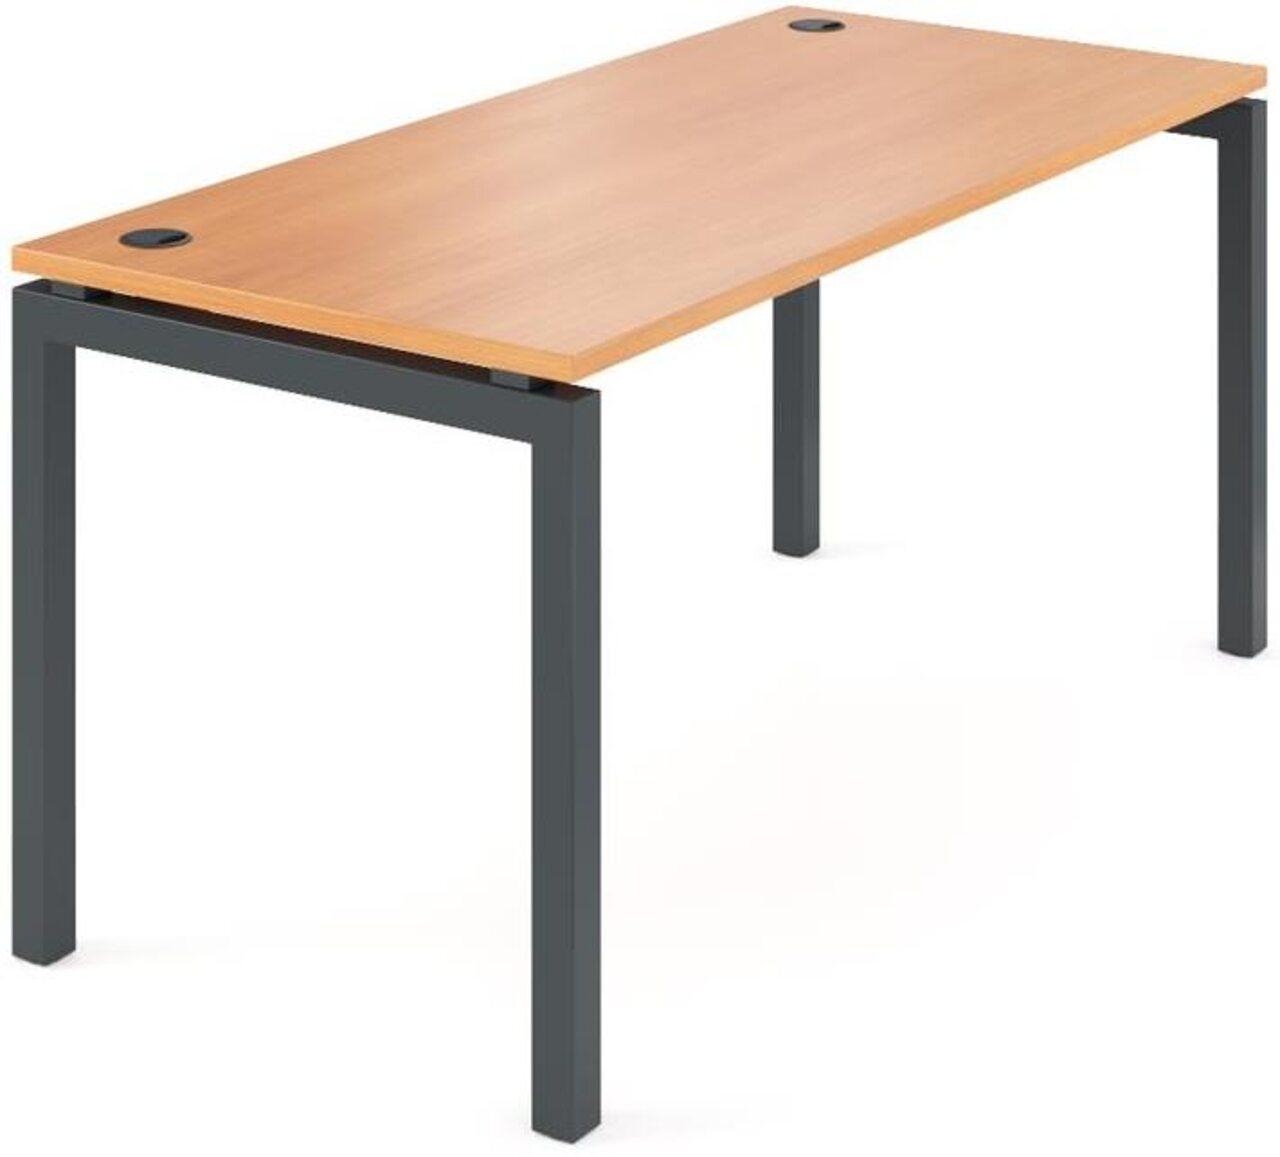 Стол на металлокаркасе  Арго 160x73x76 - фото 2